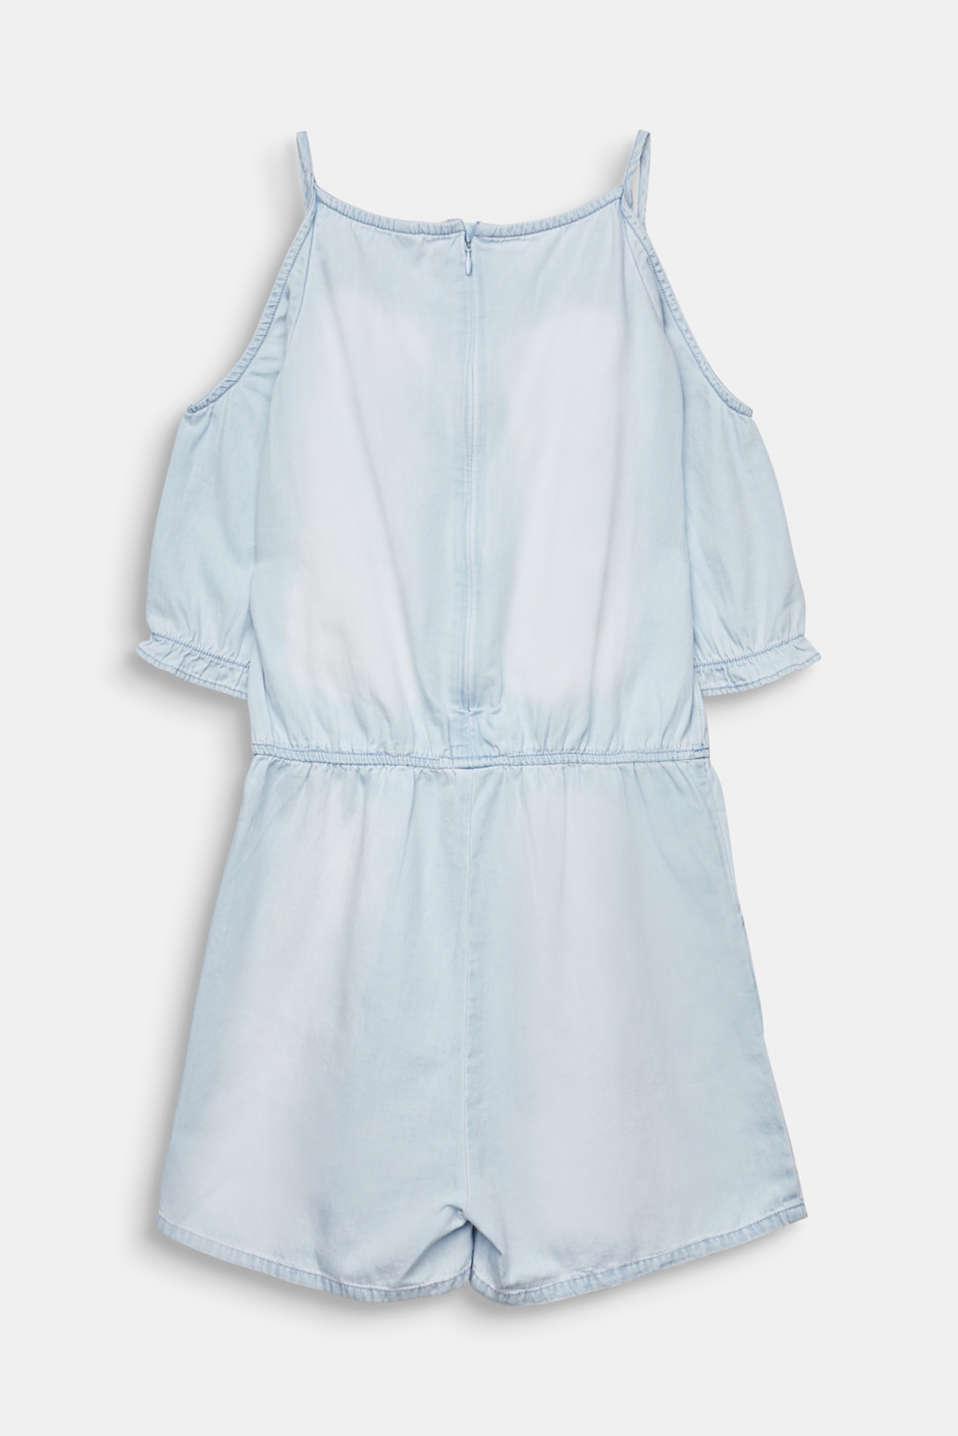 Denim jumpsuit with cut-outs, 100% cotton, LCLIGHT INDIGO D, detail image number 1